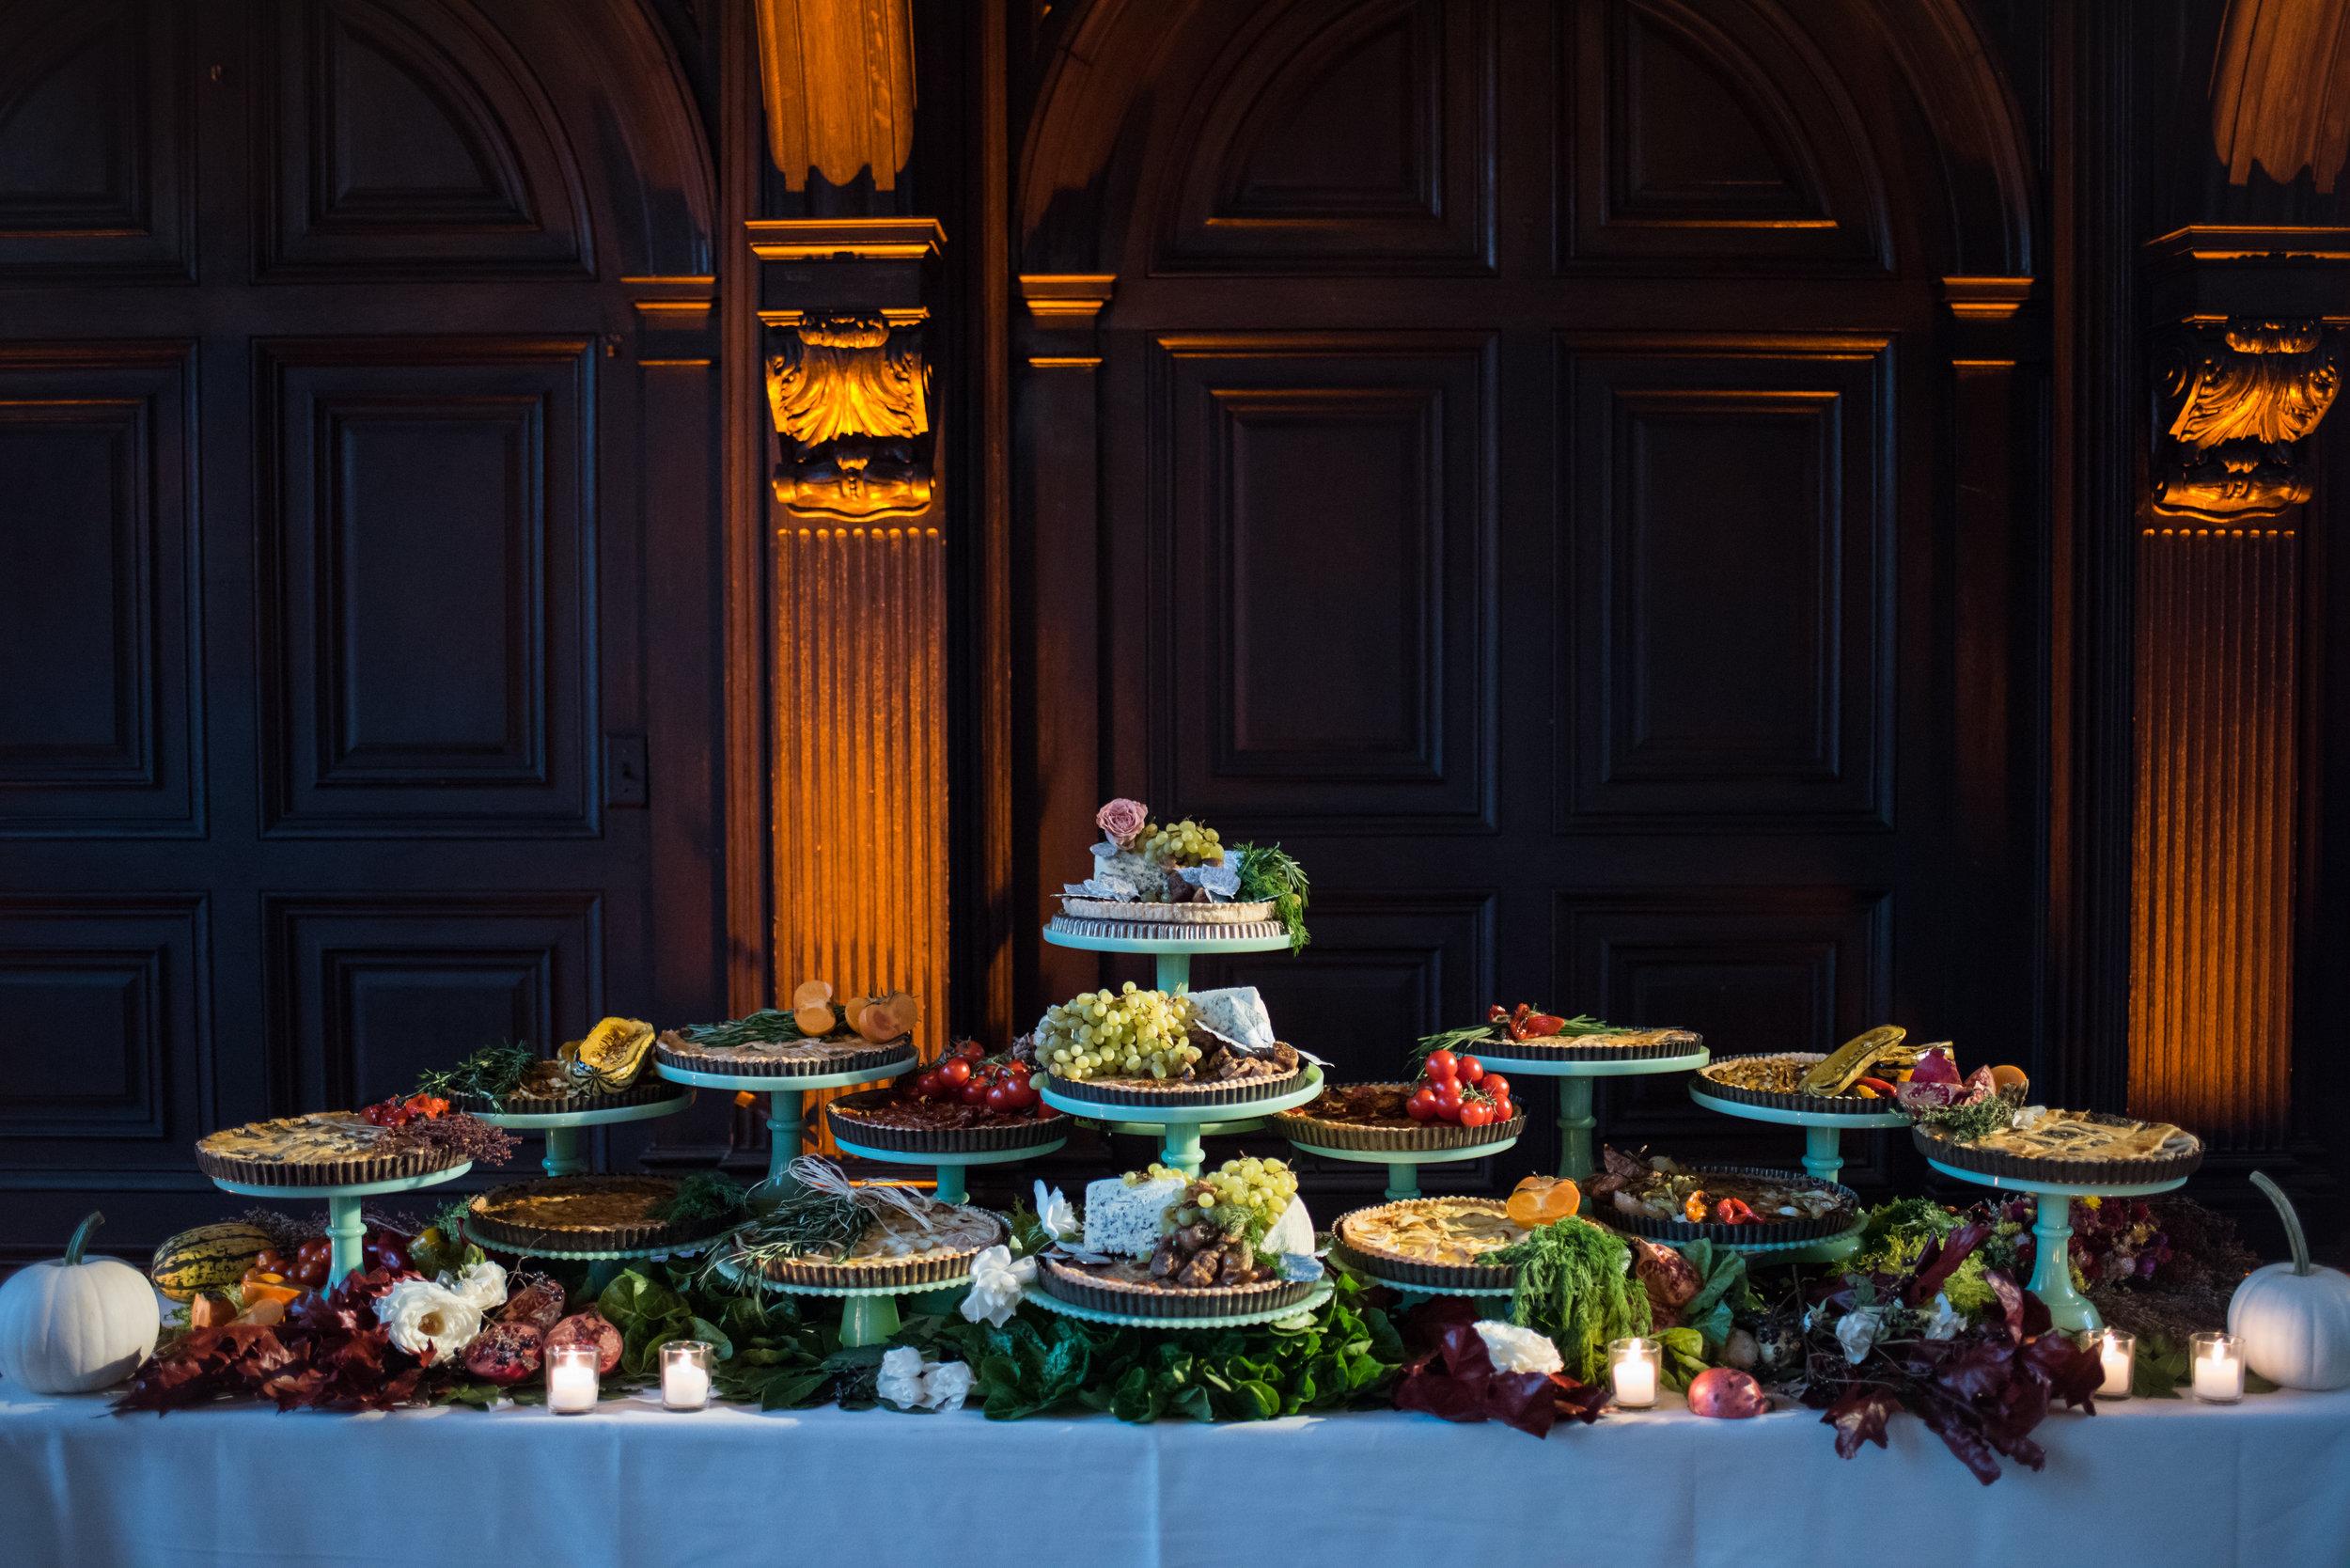 Fall wedding tart display.  Photo by Cappy Hotchkiss.